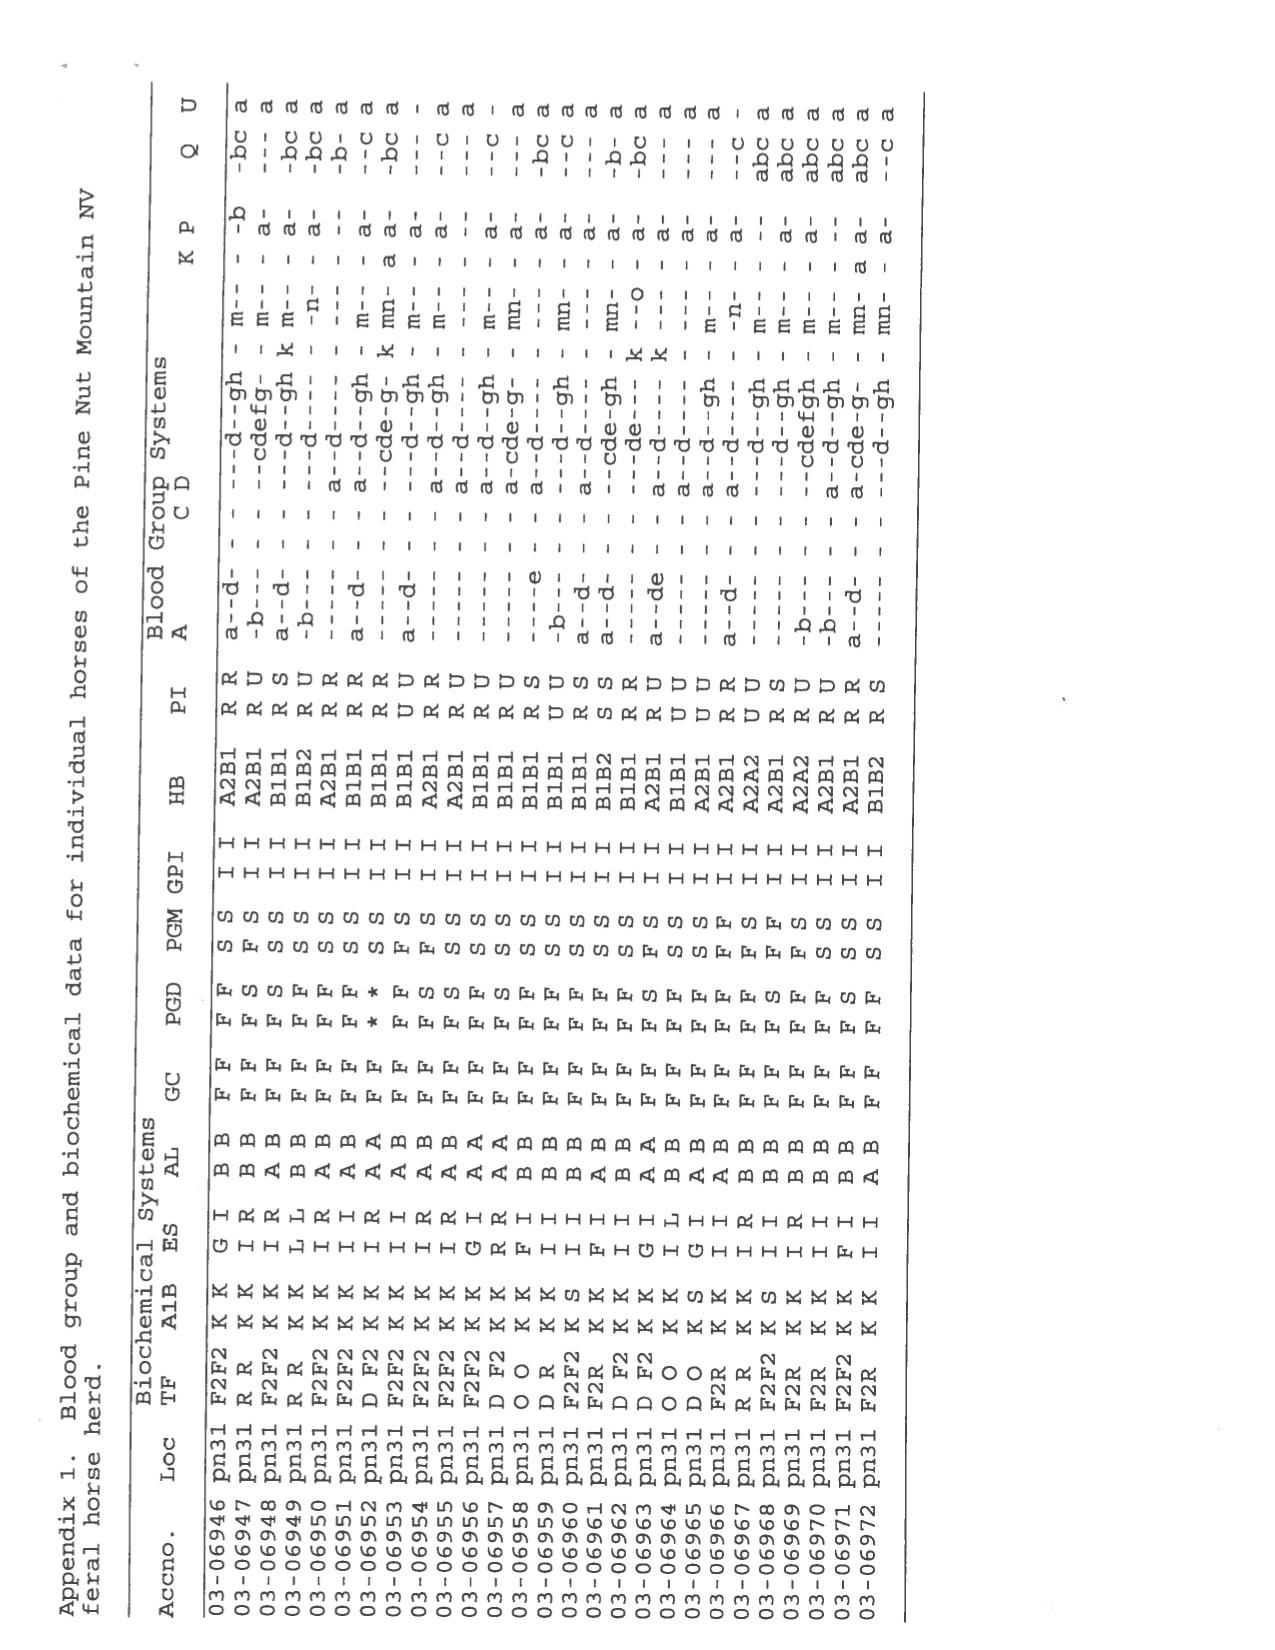 PM Pine Nut genetic Viability P13 Oct 2009